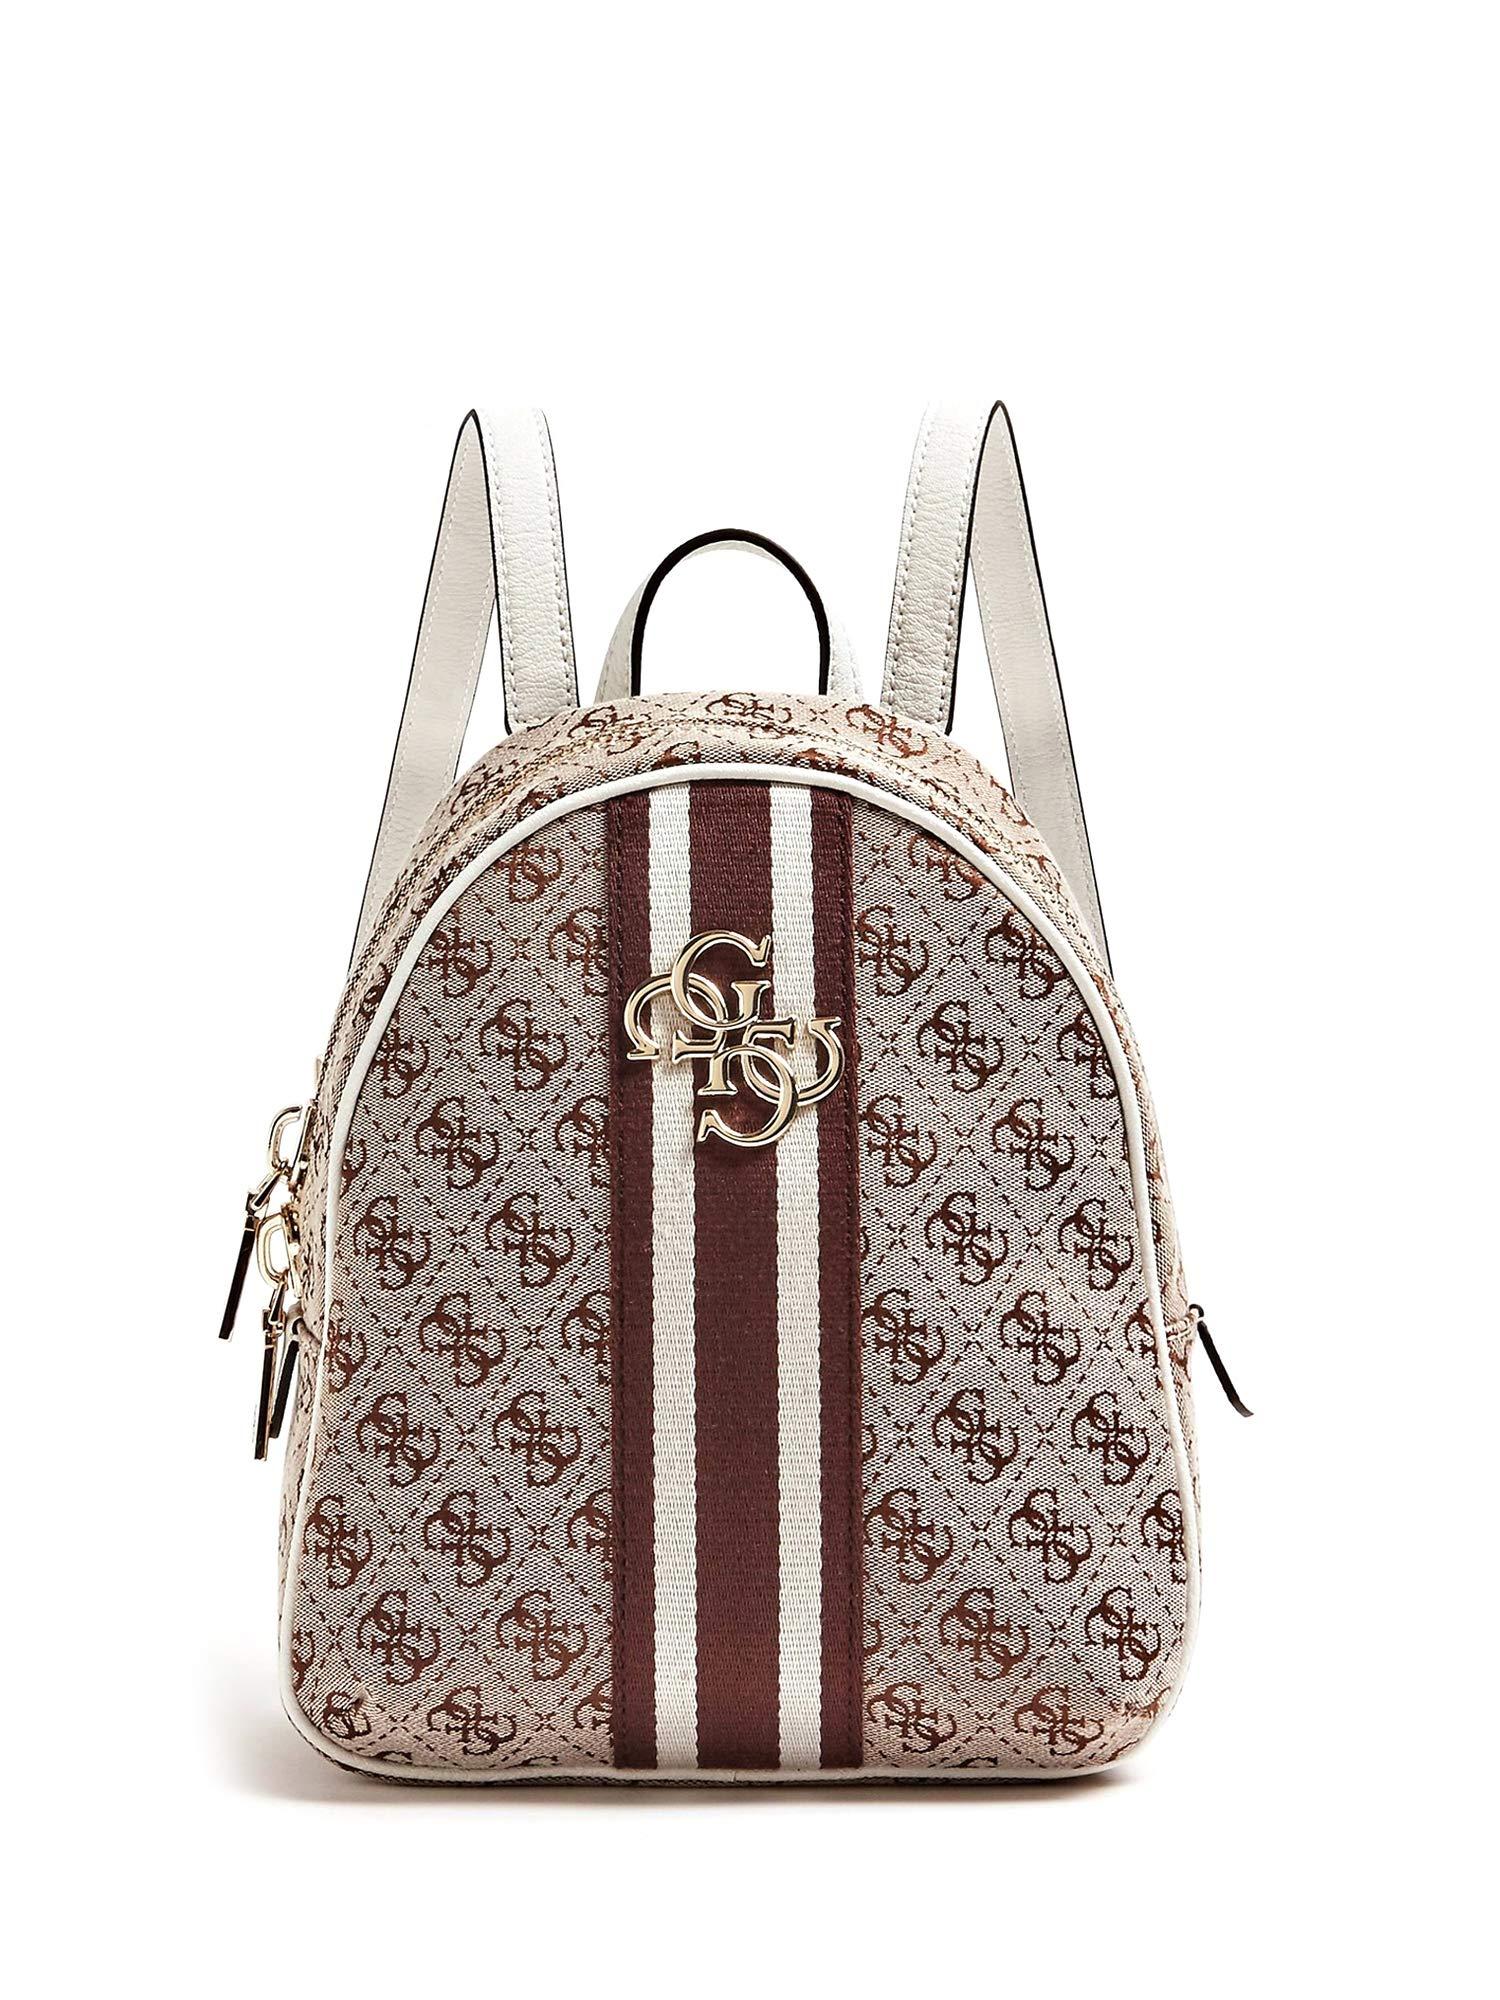 81eTofHqA8L - Guess Vintage Backpack - Mochilas Mujer